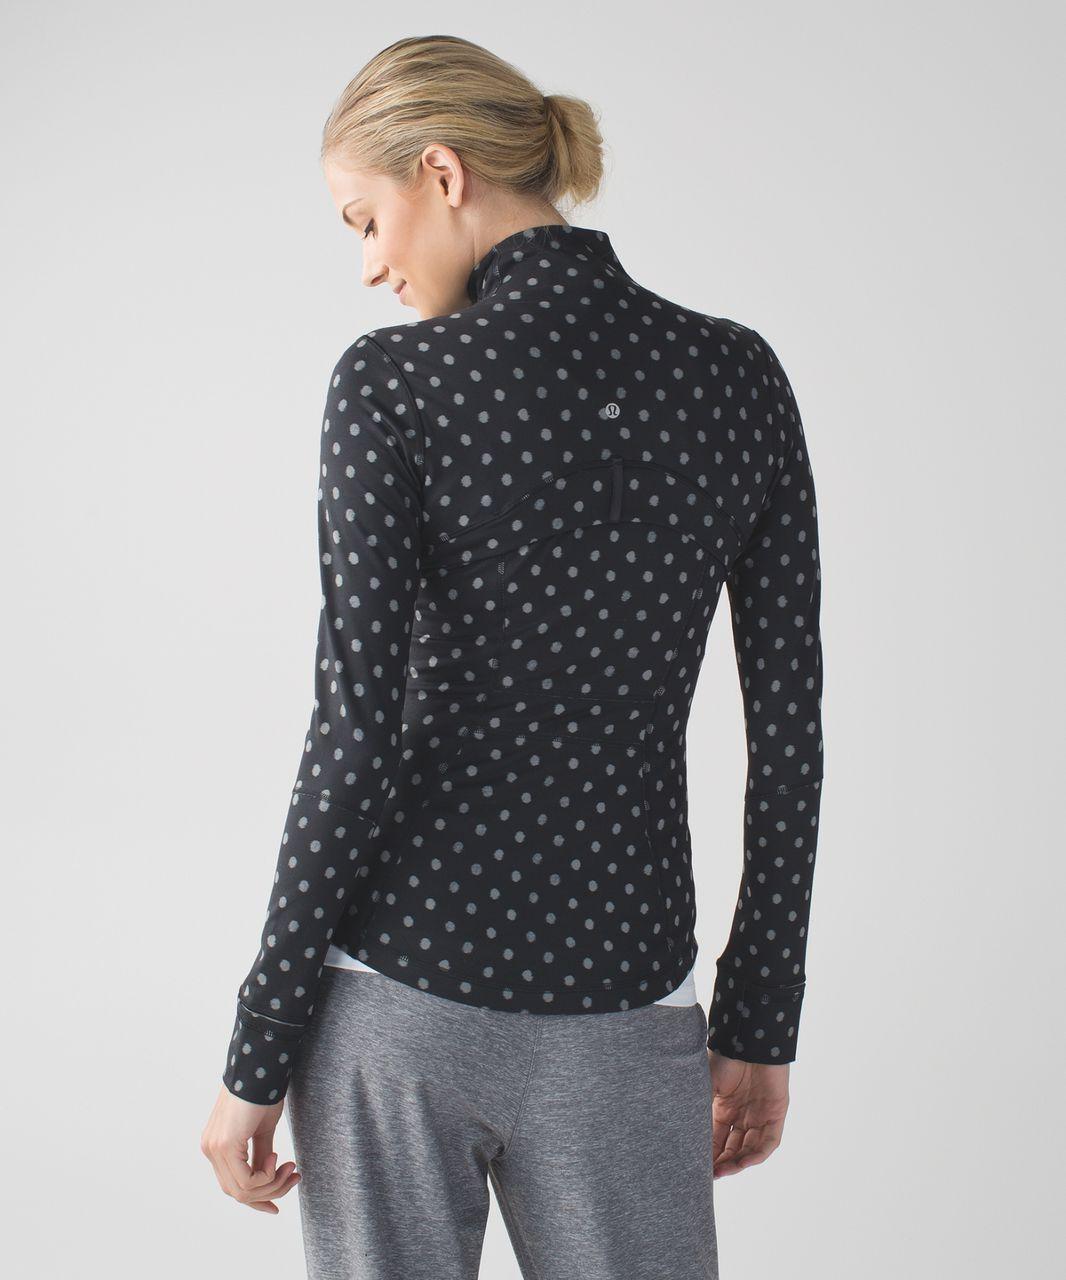 Lululemon Define Jacket - Ghost Dot Black Slate